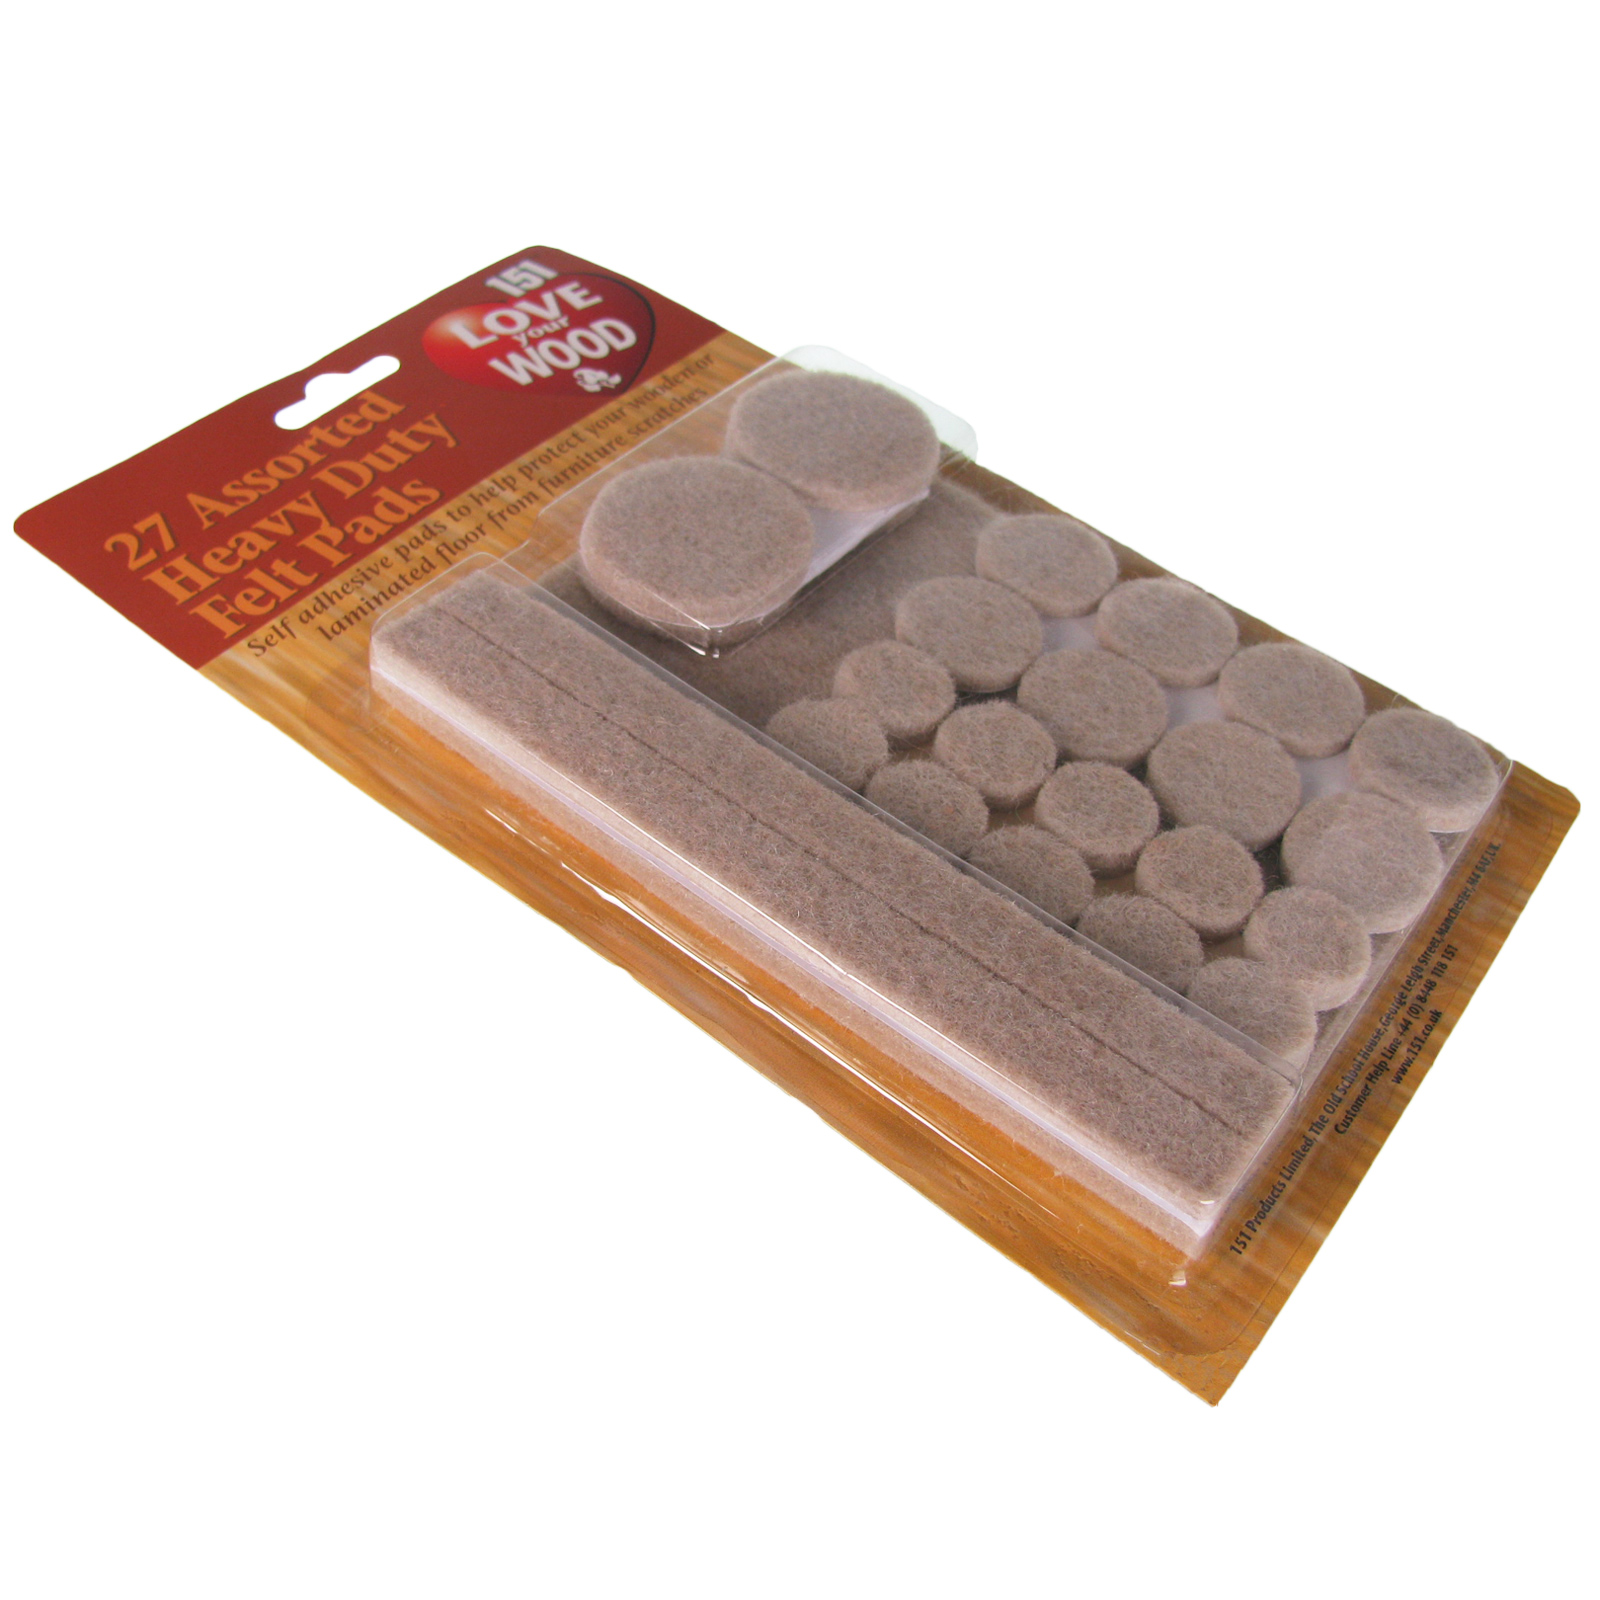 Furniture Felt Pads Floor Protector Wood Adhesive Laminate